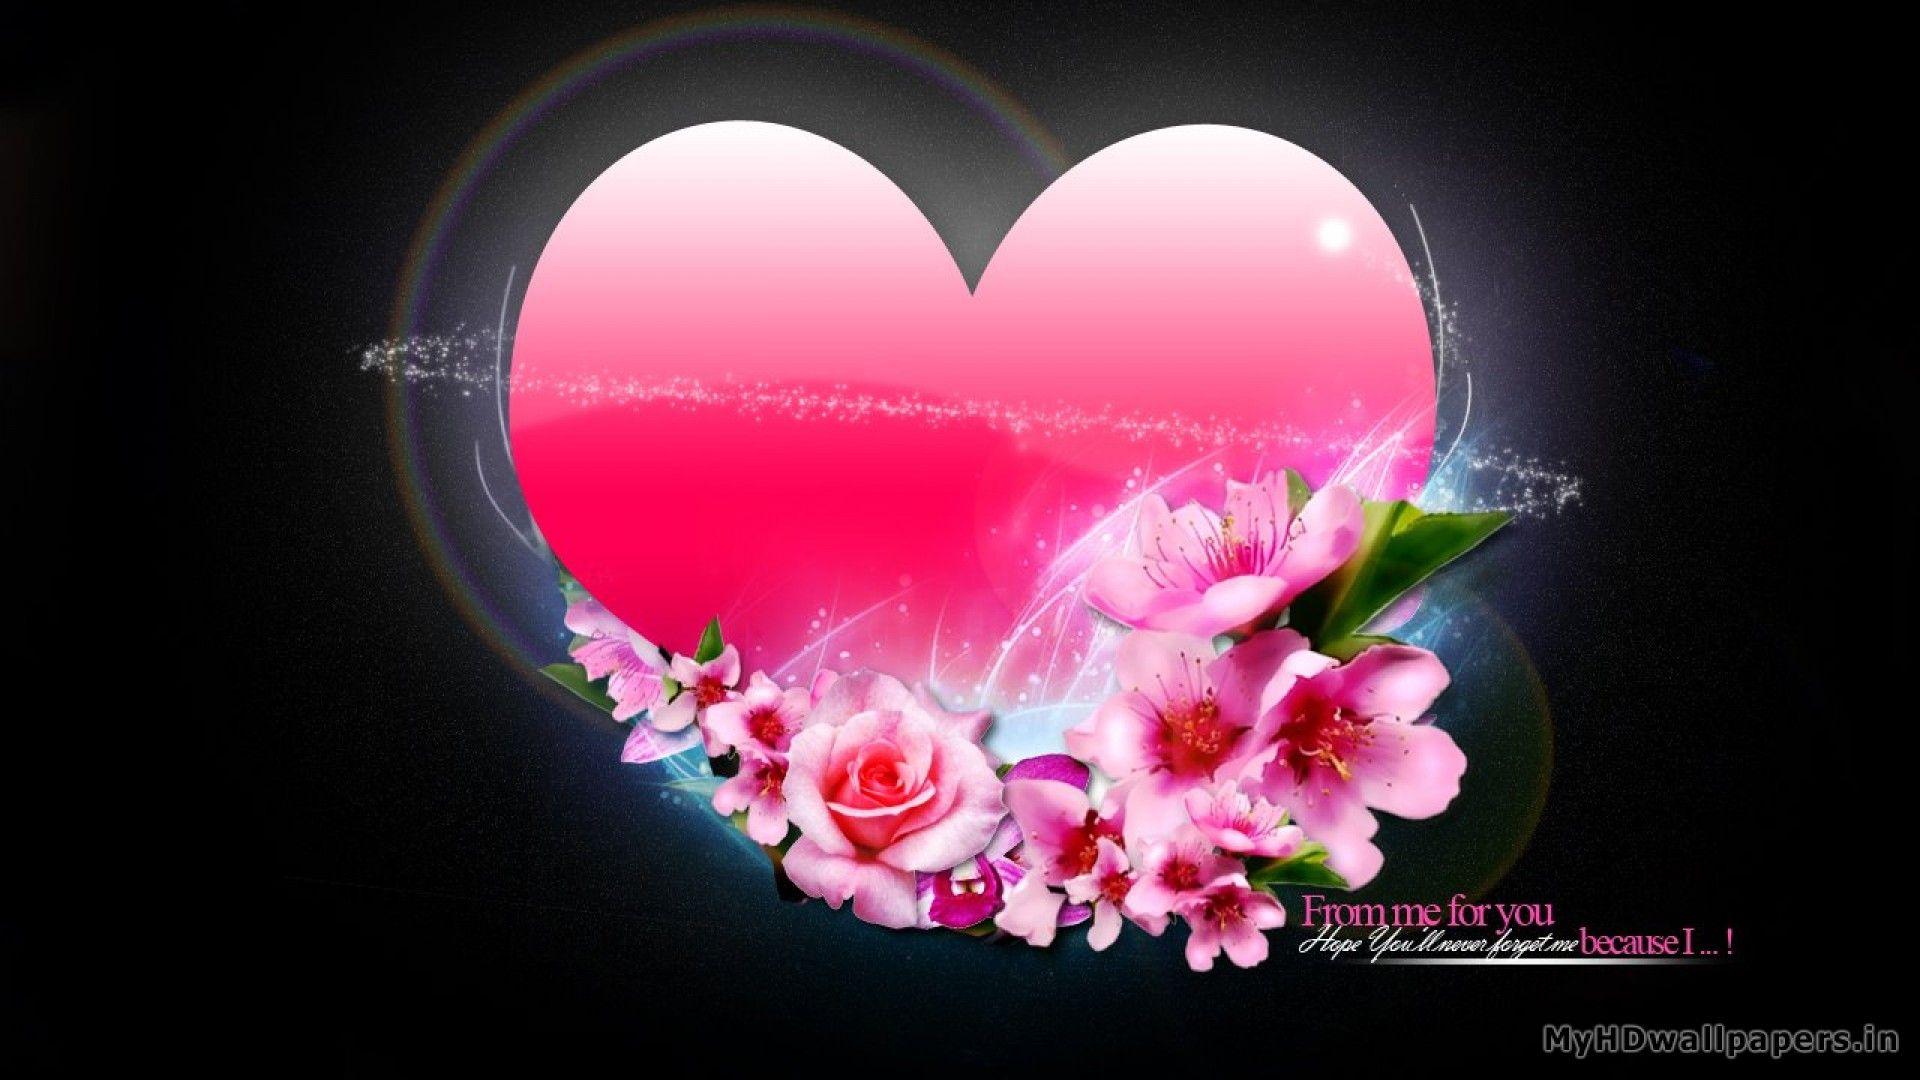 Heart flowers httpsuperwallpaperswallpaperheart flowers heart flowers httpsuperwallpaperswallpaperheart izmirmasajfo